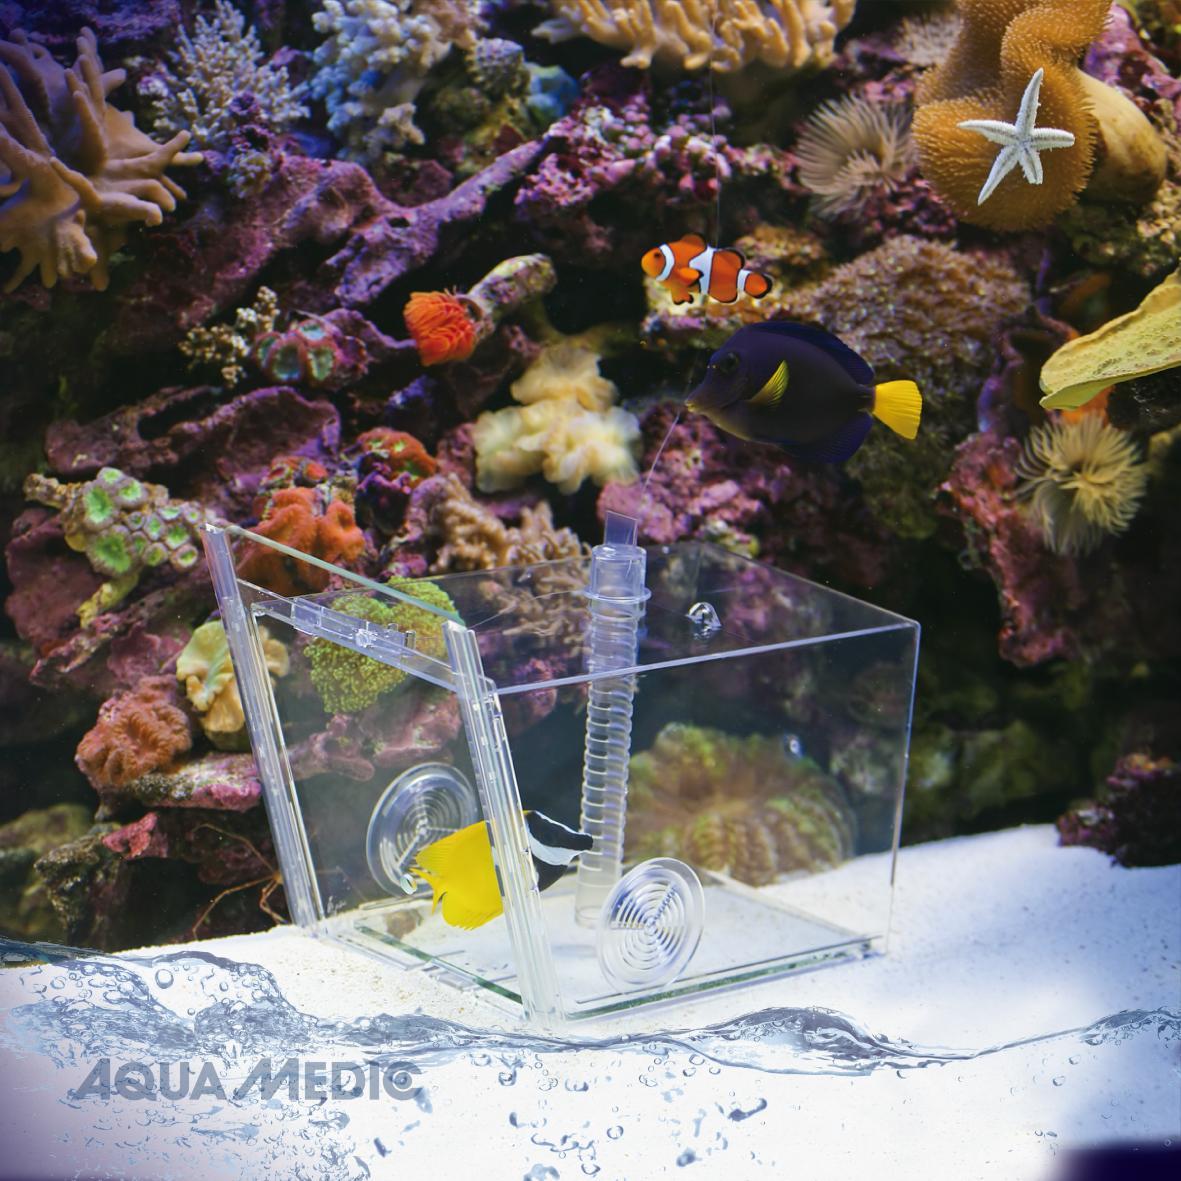 Aquamedic Fish Trap 27x17x17cm